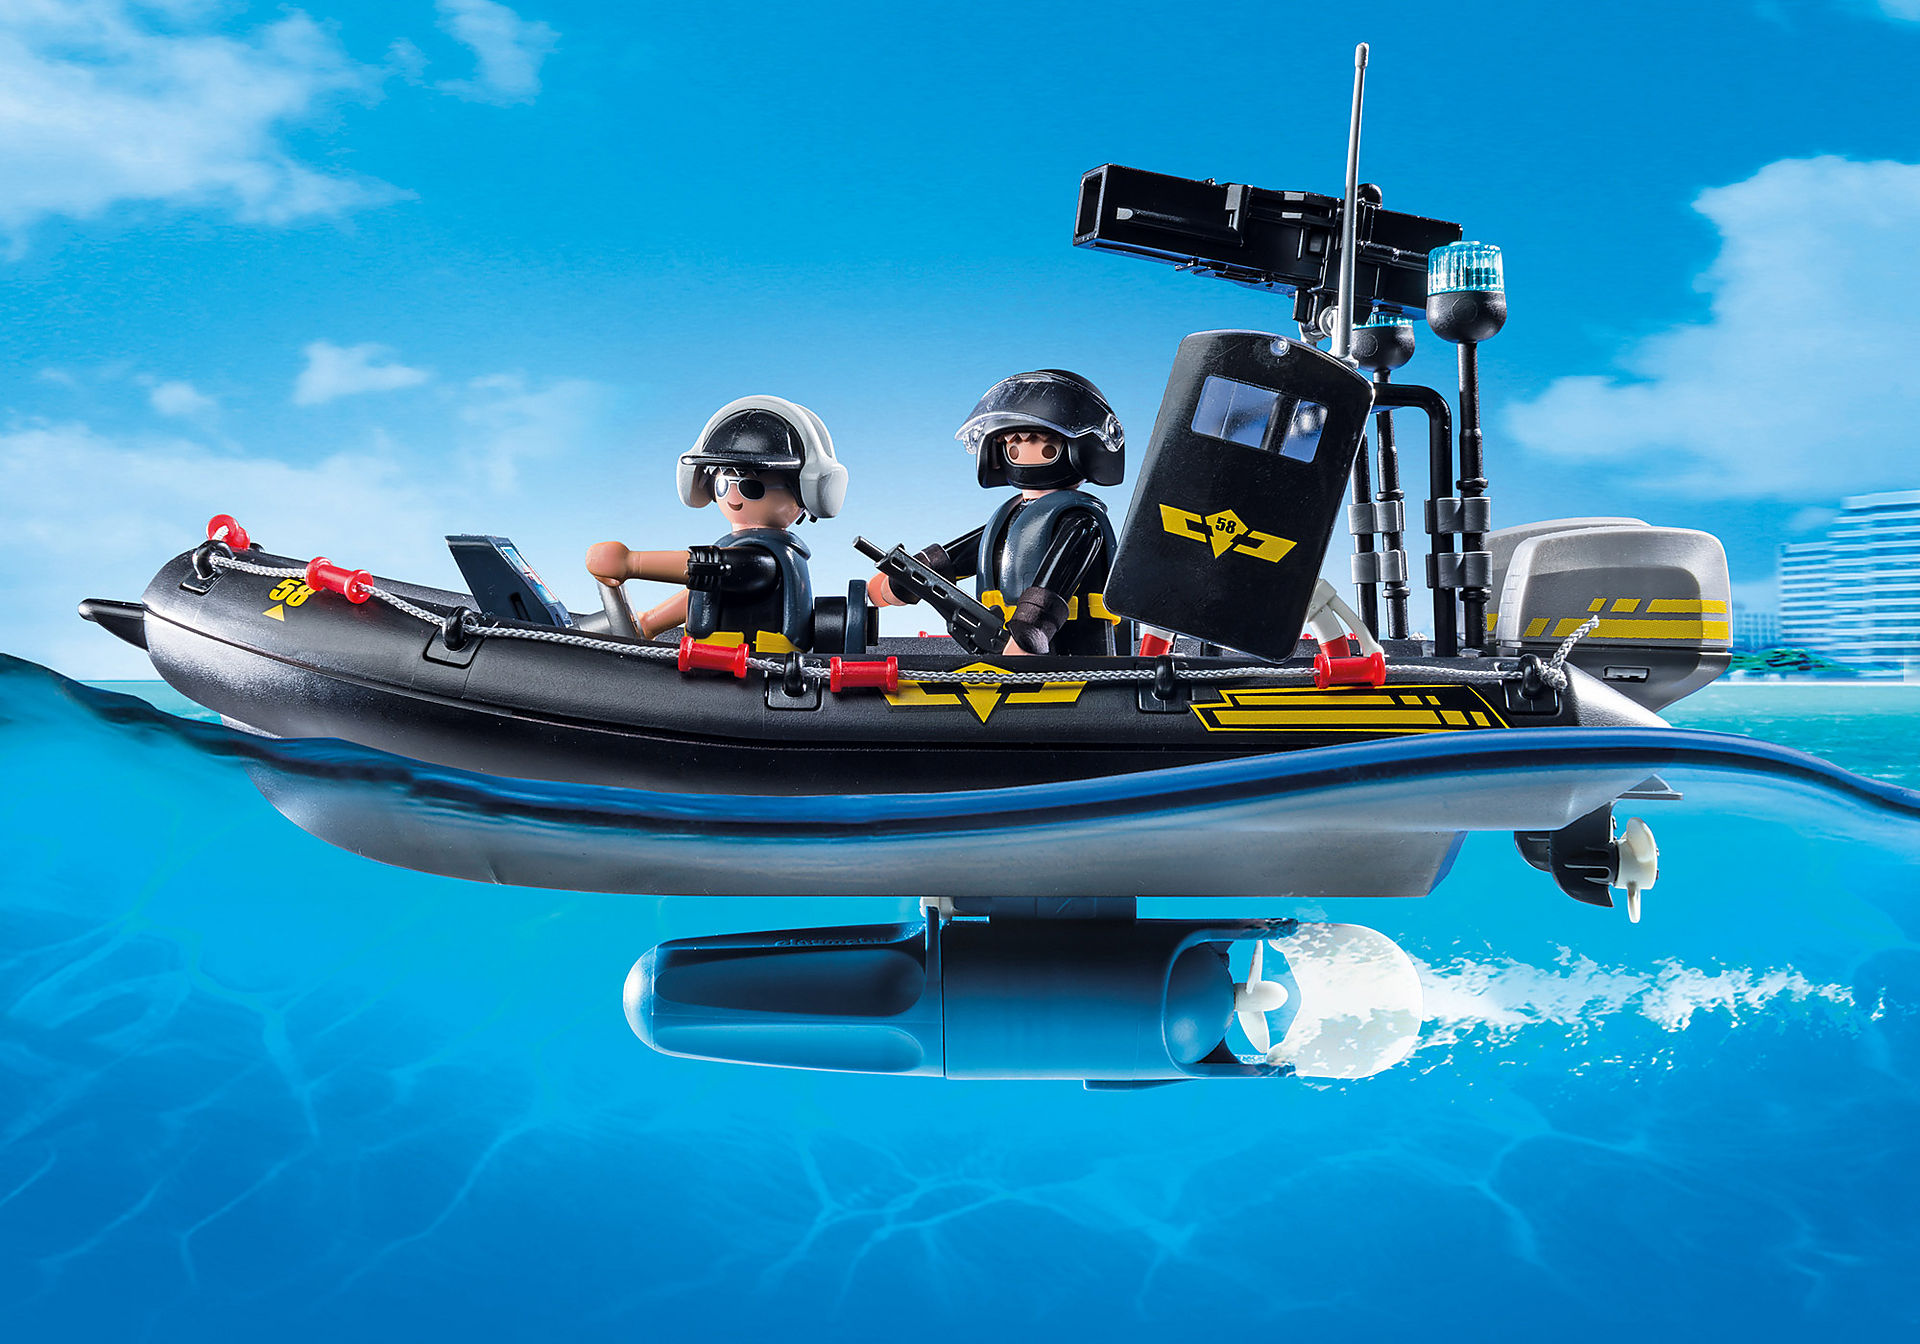 http://media.playmobil.com/i/playmobil/9362_product_extra2/SWAT Boat